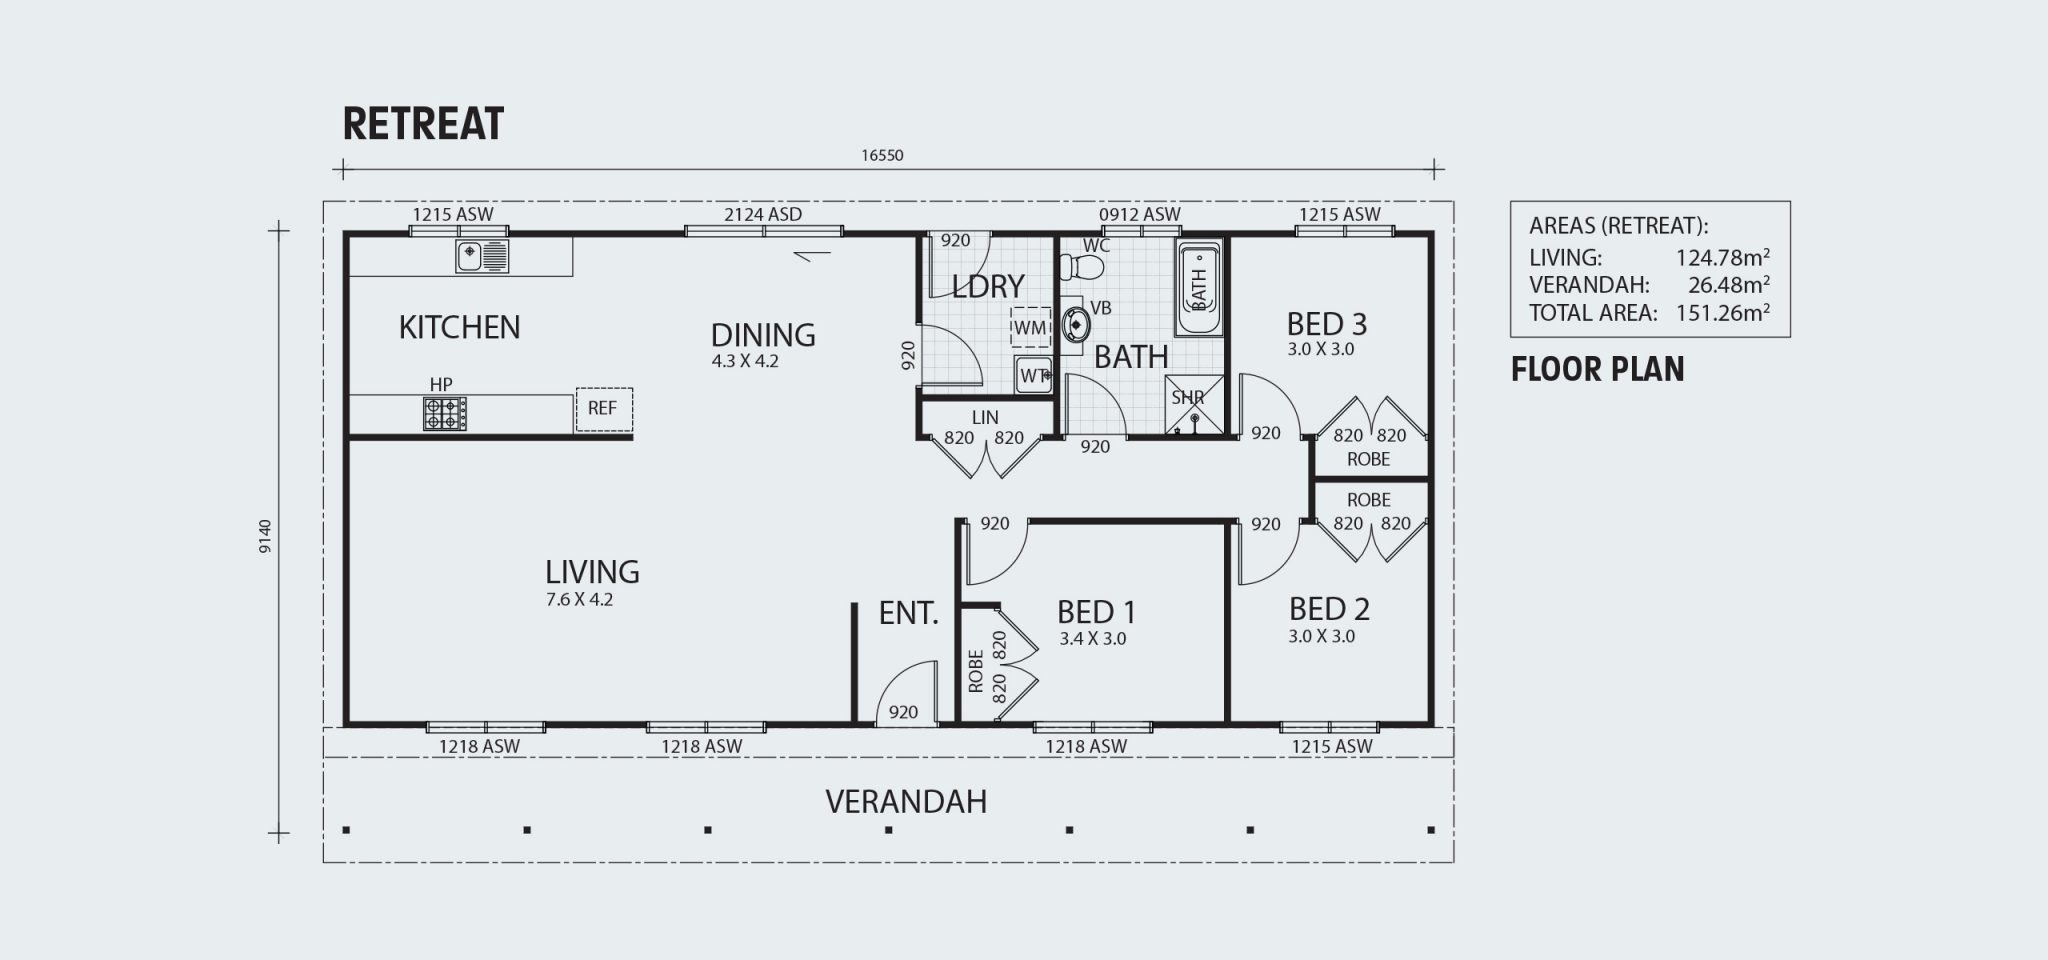 Retreat R151 Floorplan